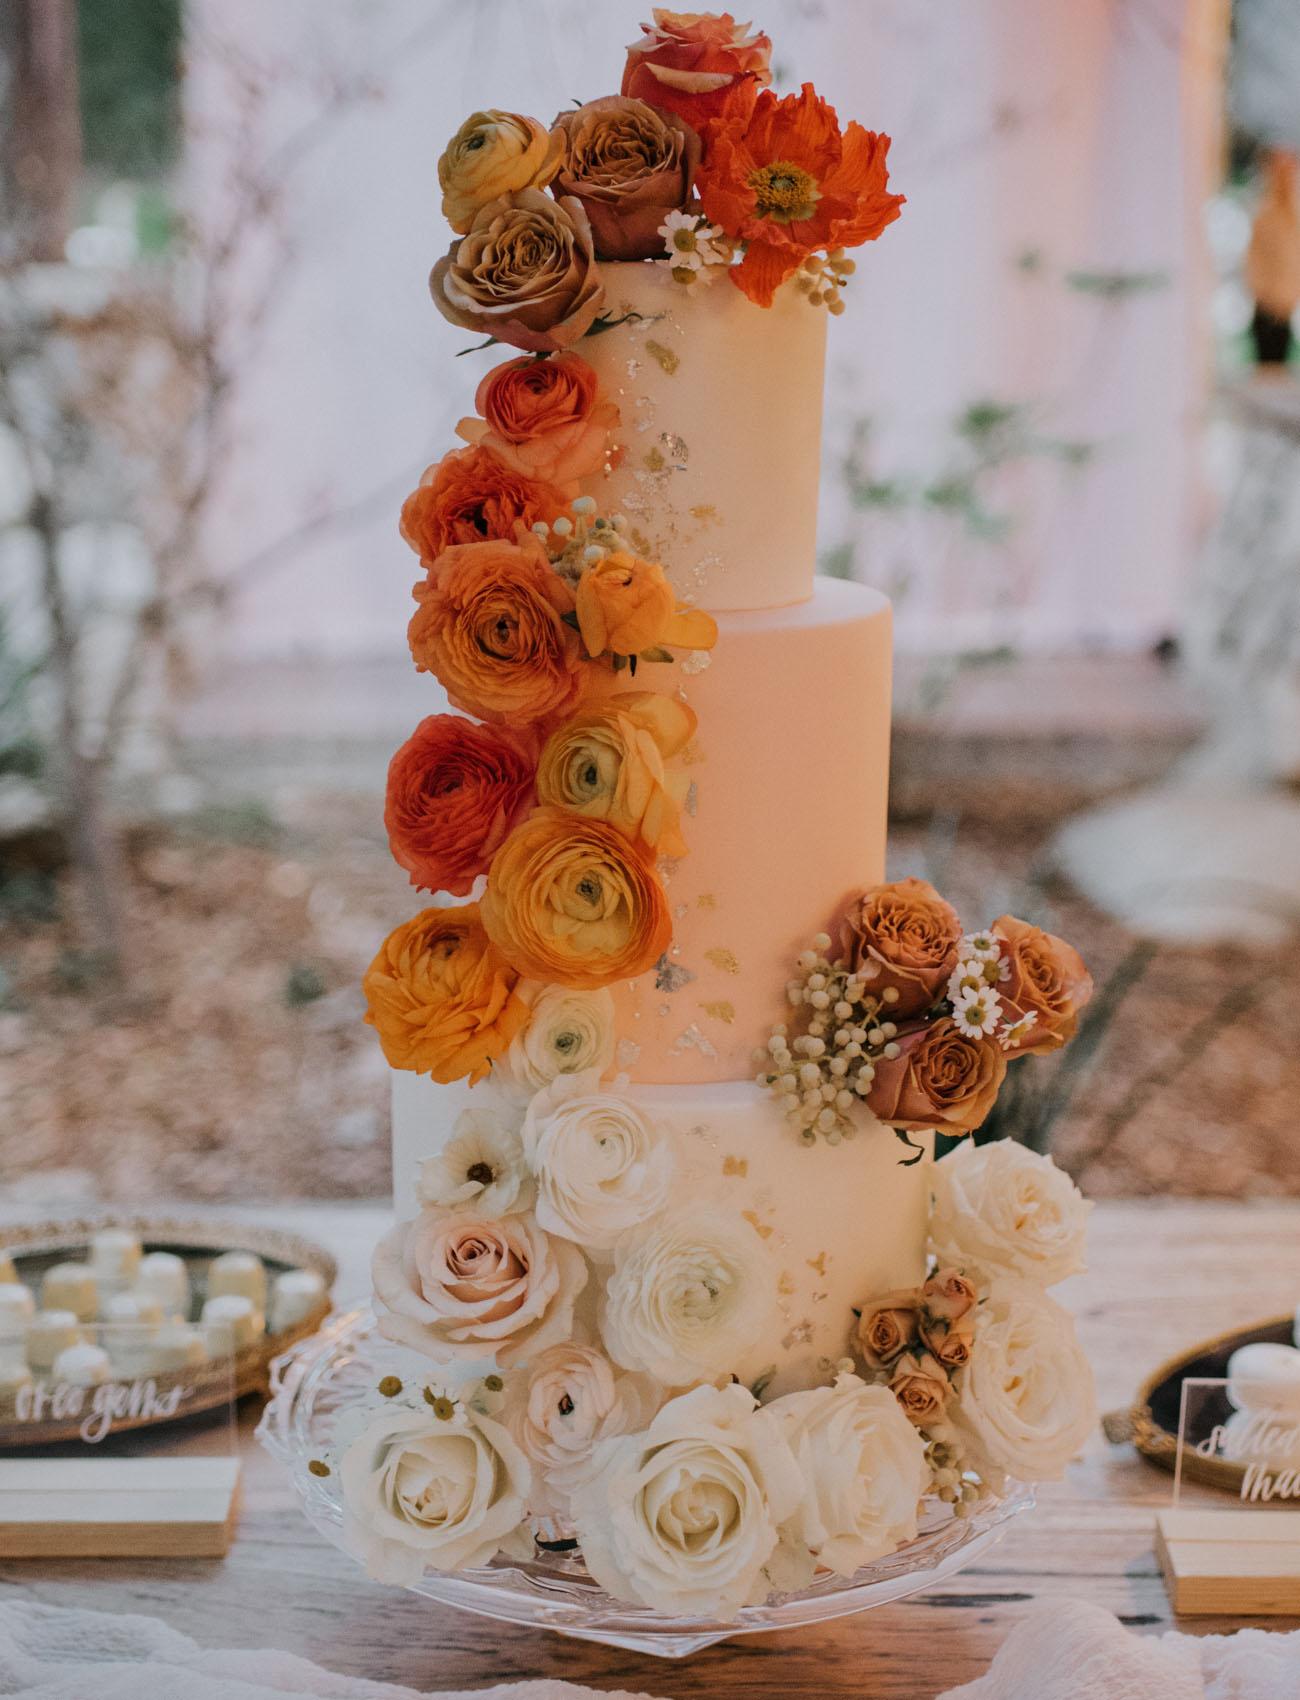 favorite wedding cakes of 2018